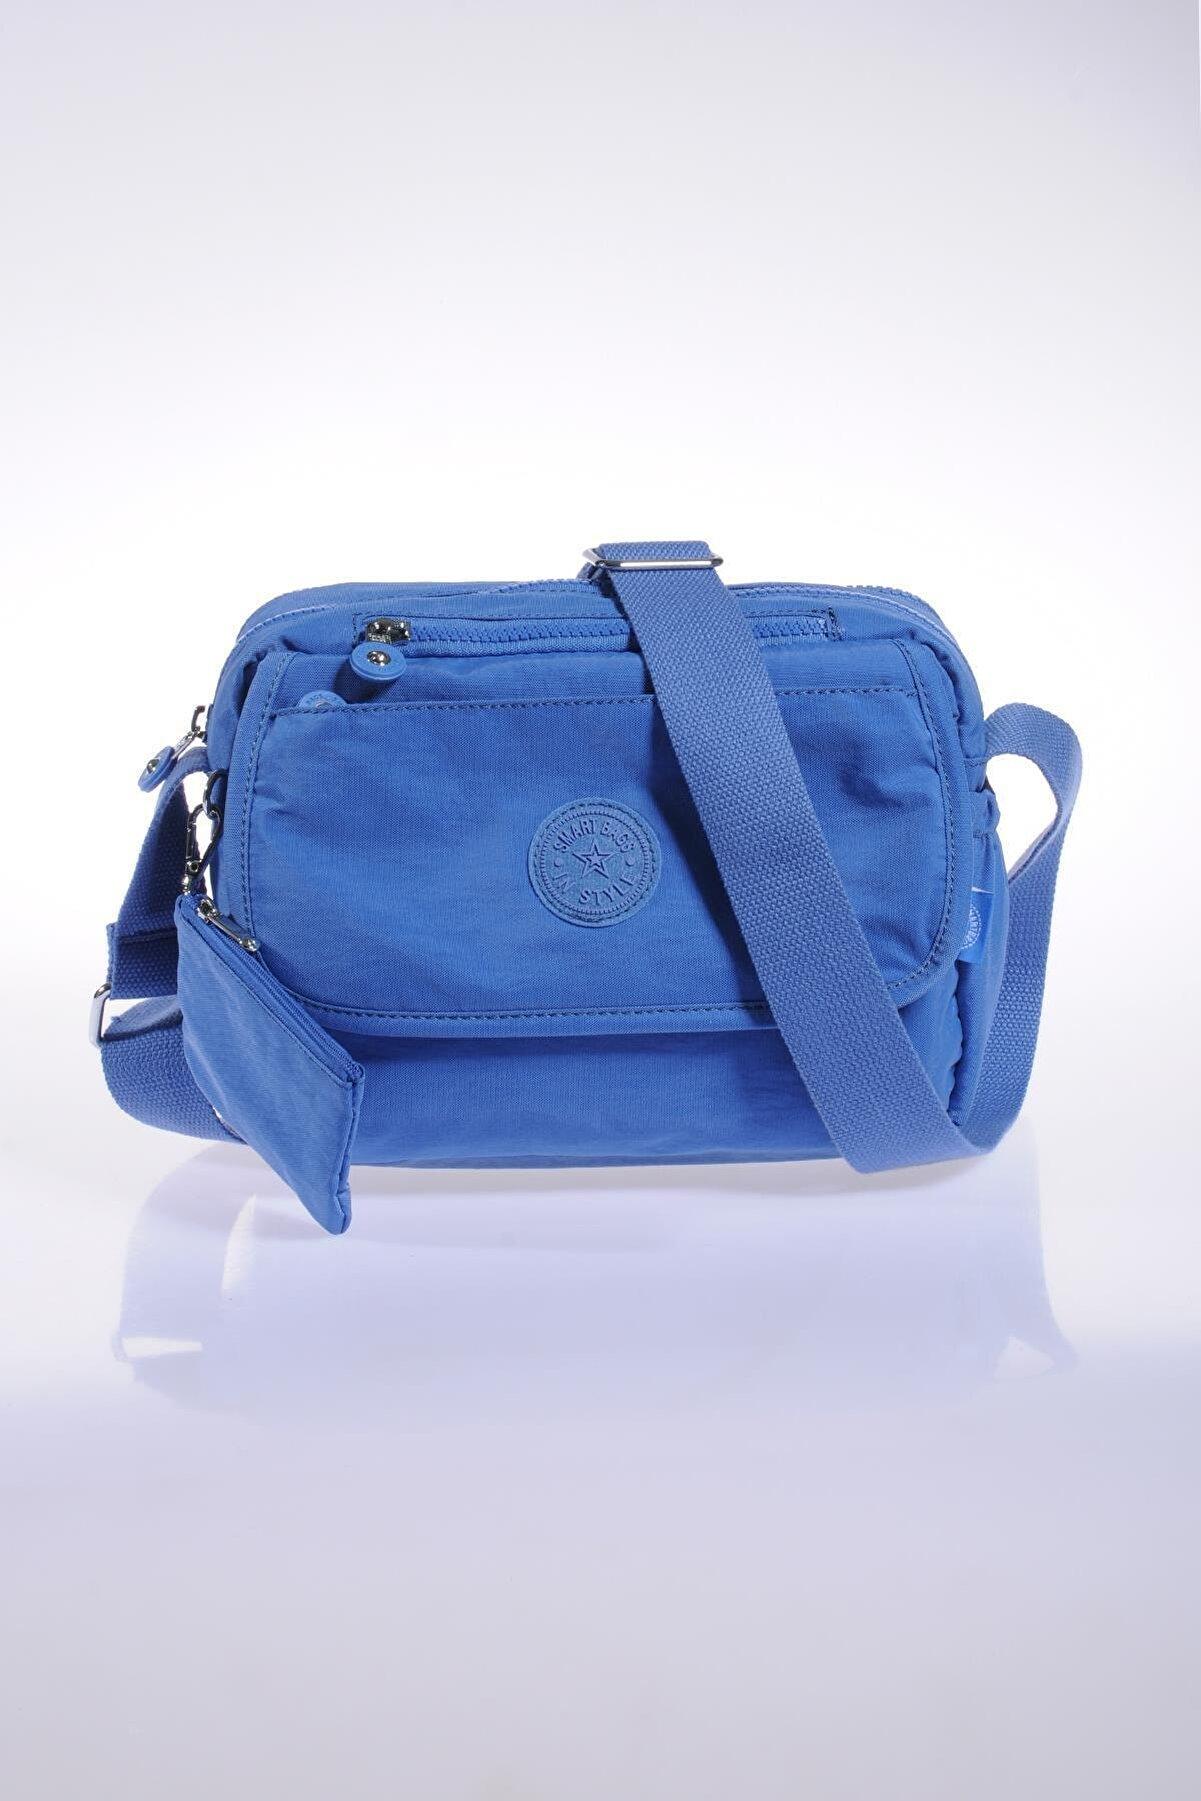 Smart Bags Smb1172-0031 N.mavi Kadın Çapraz Çanta